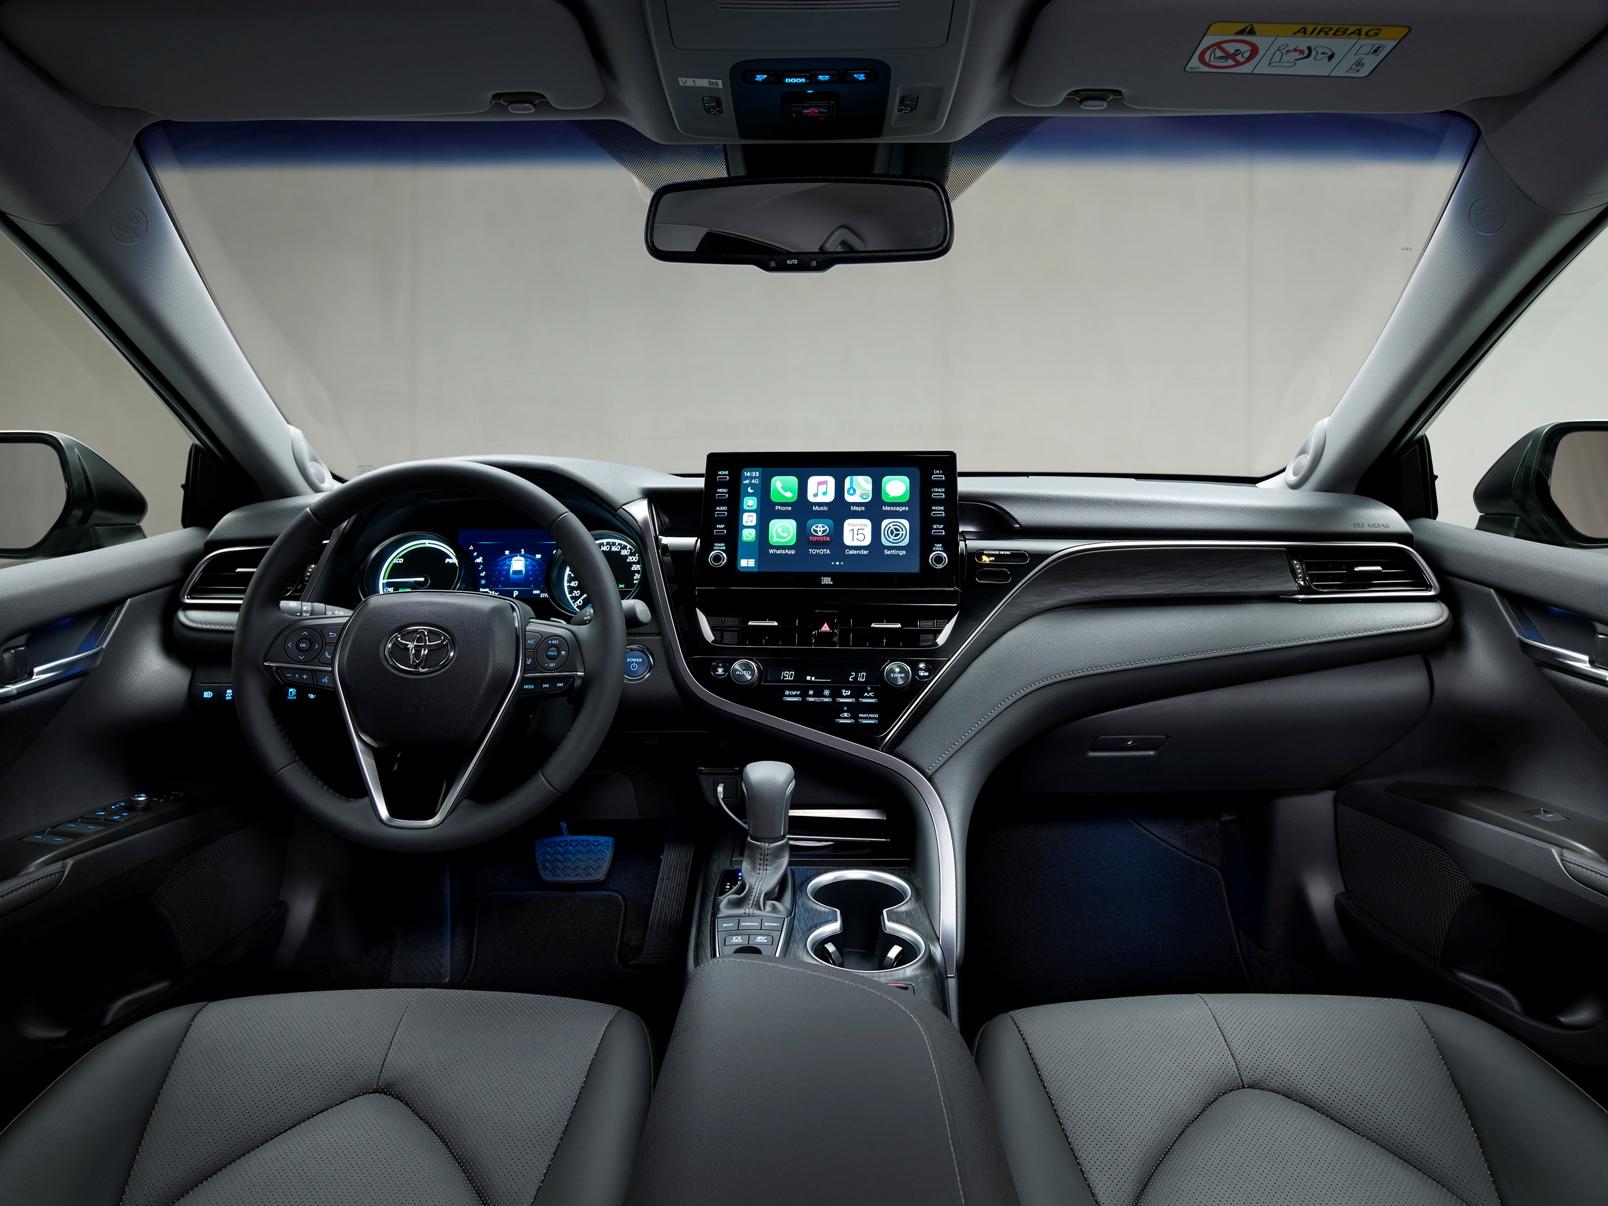 Toyota Camry Electric Hybrid 2021 (11)